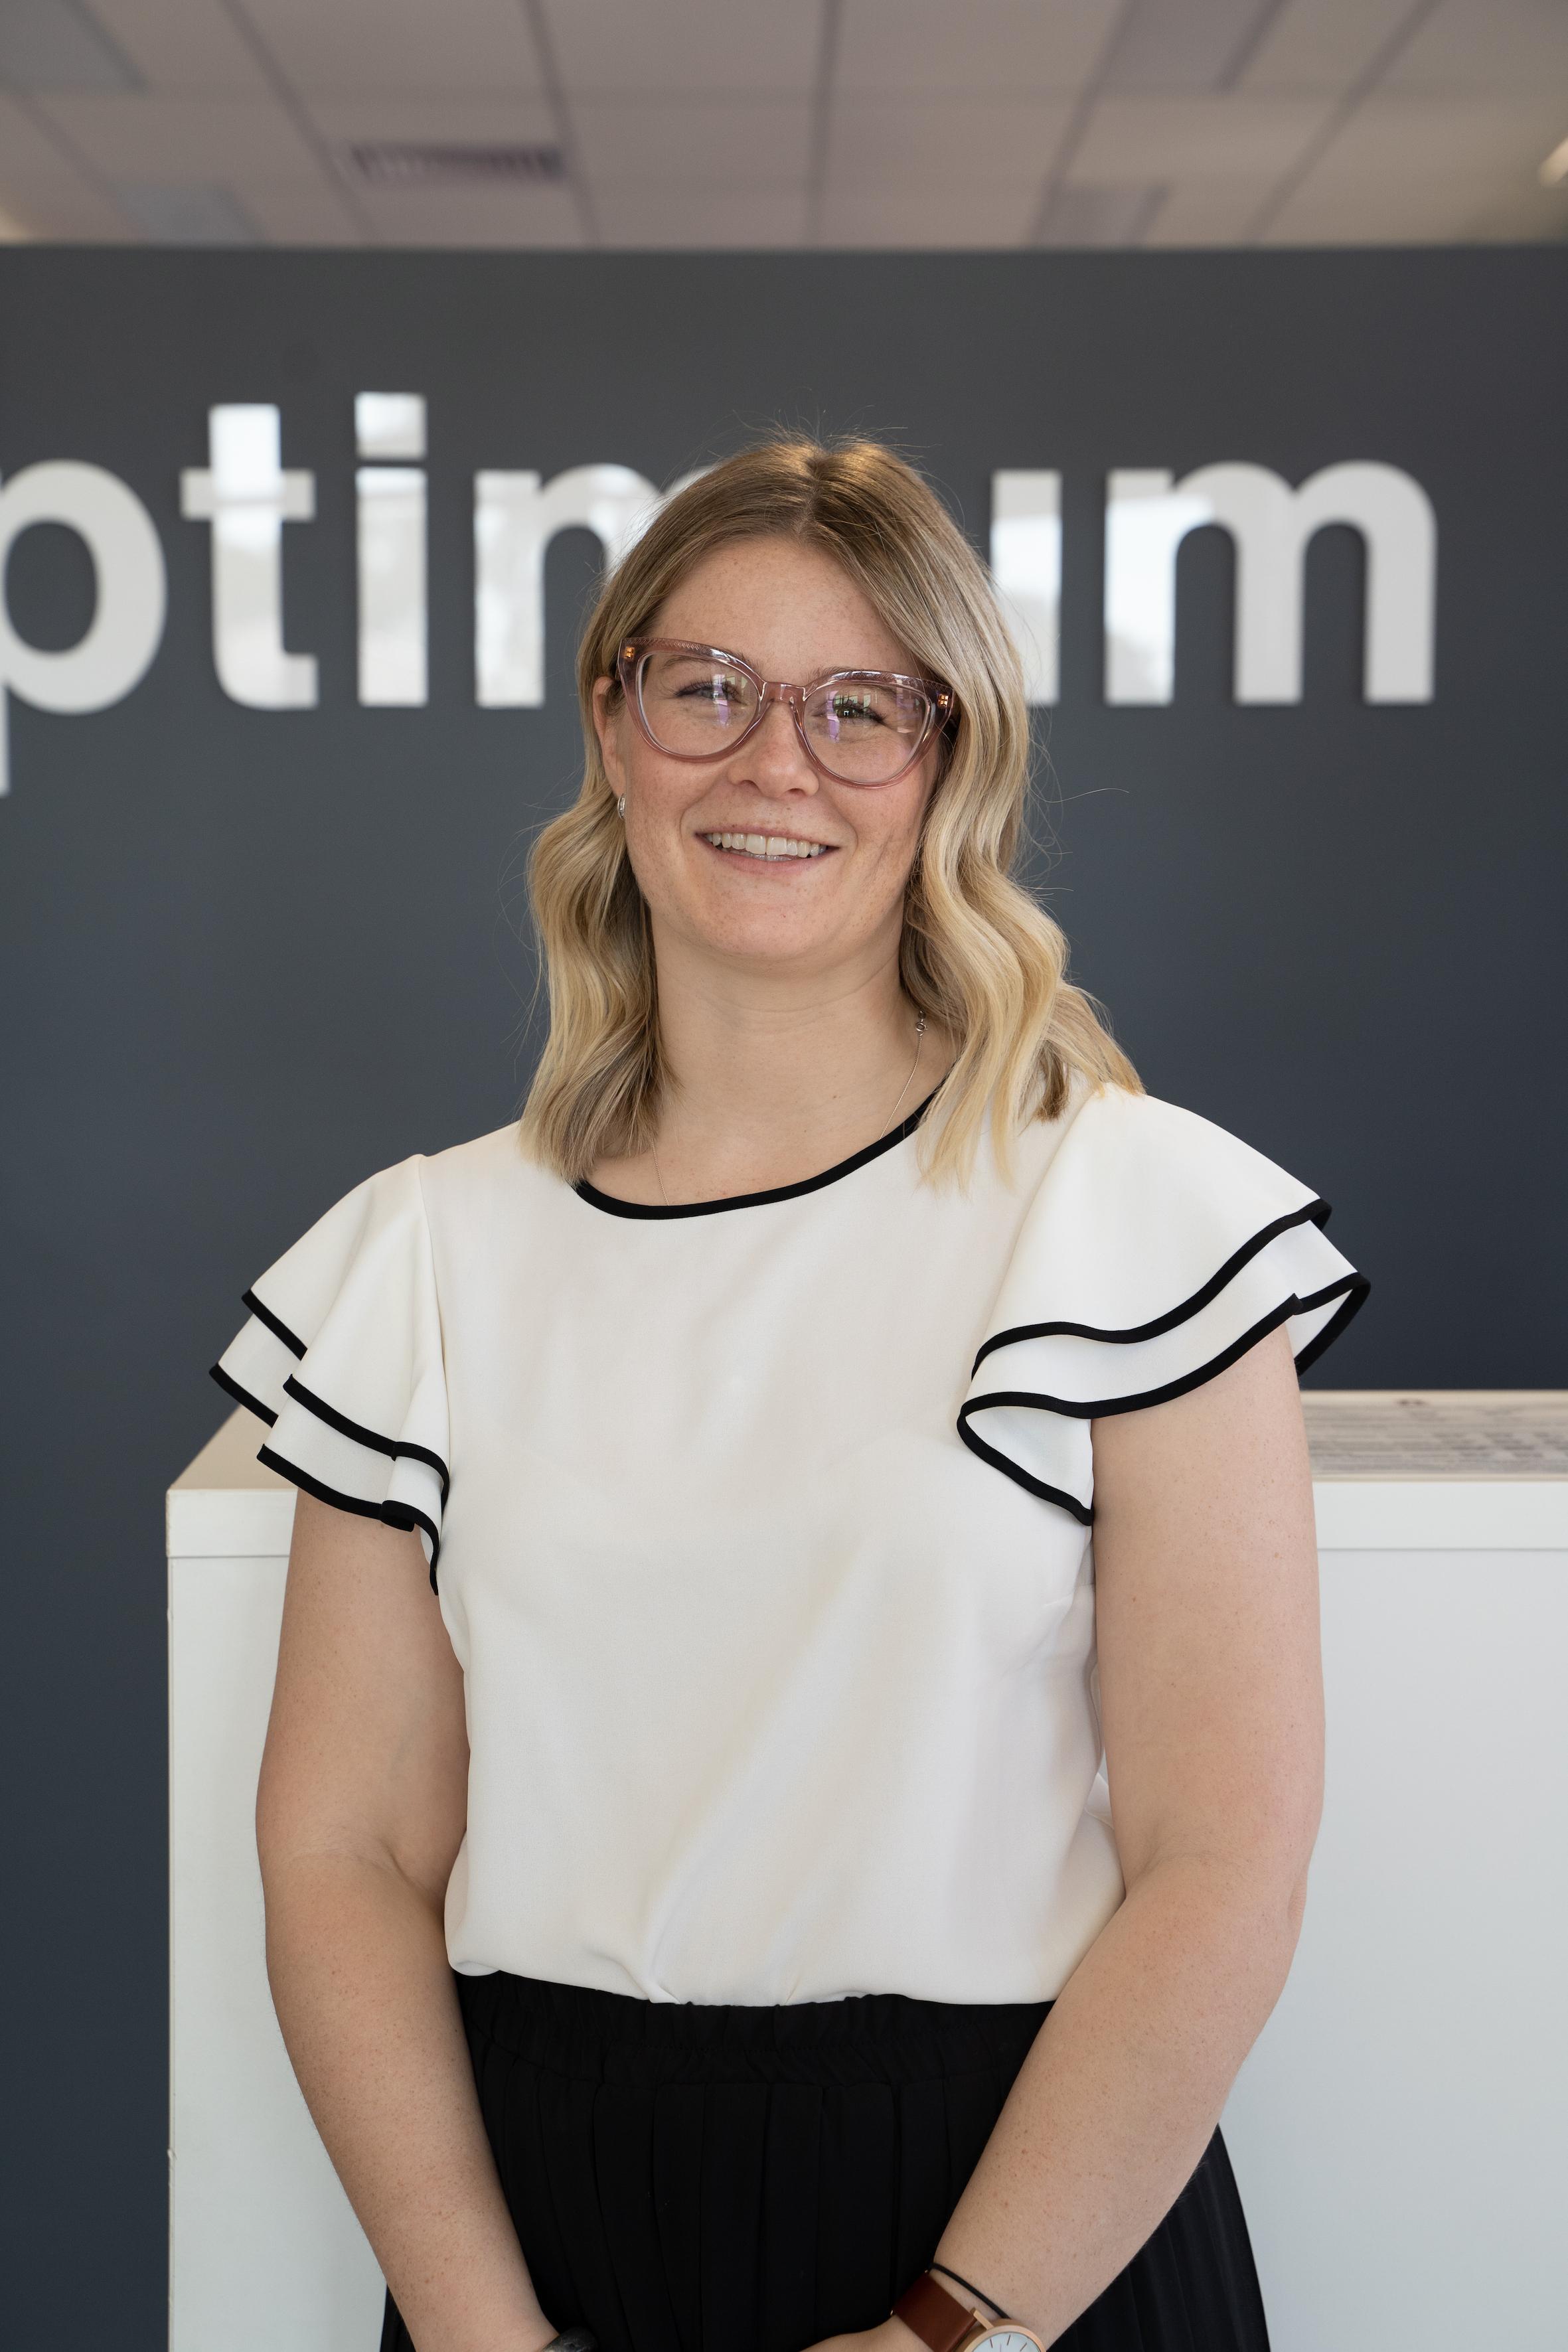 Olivia Roennfeldt